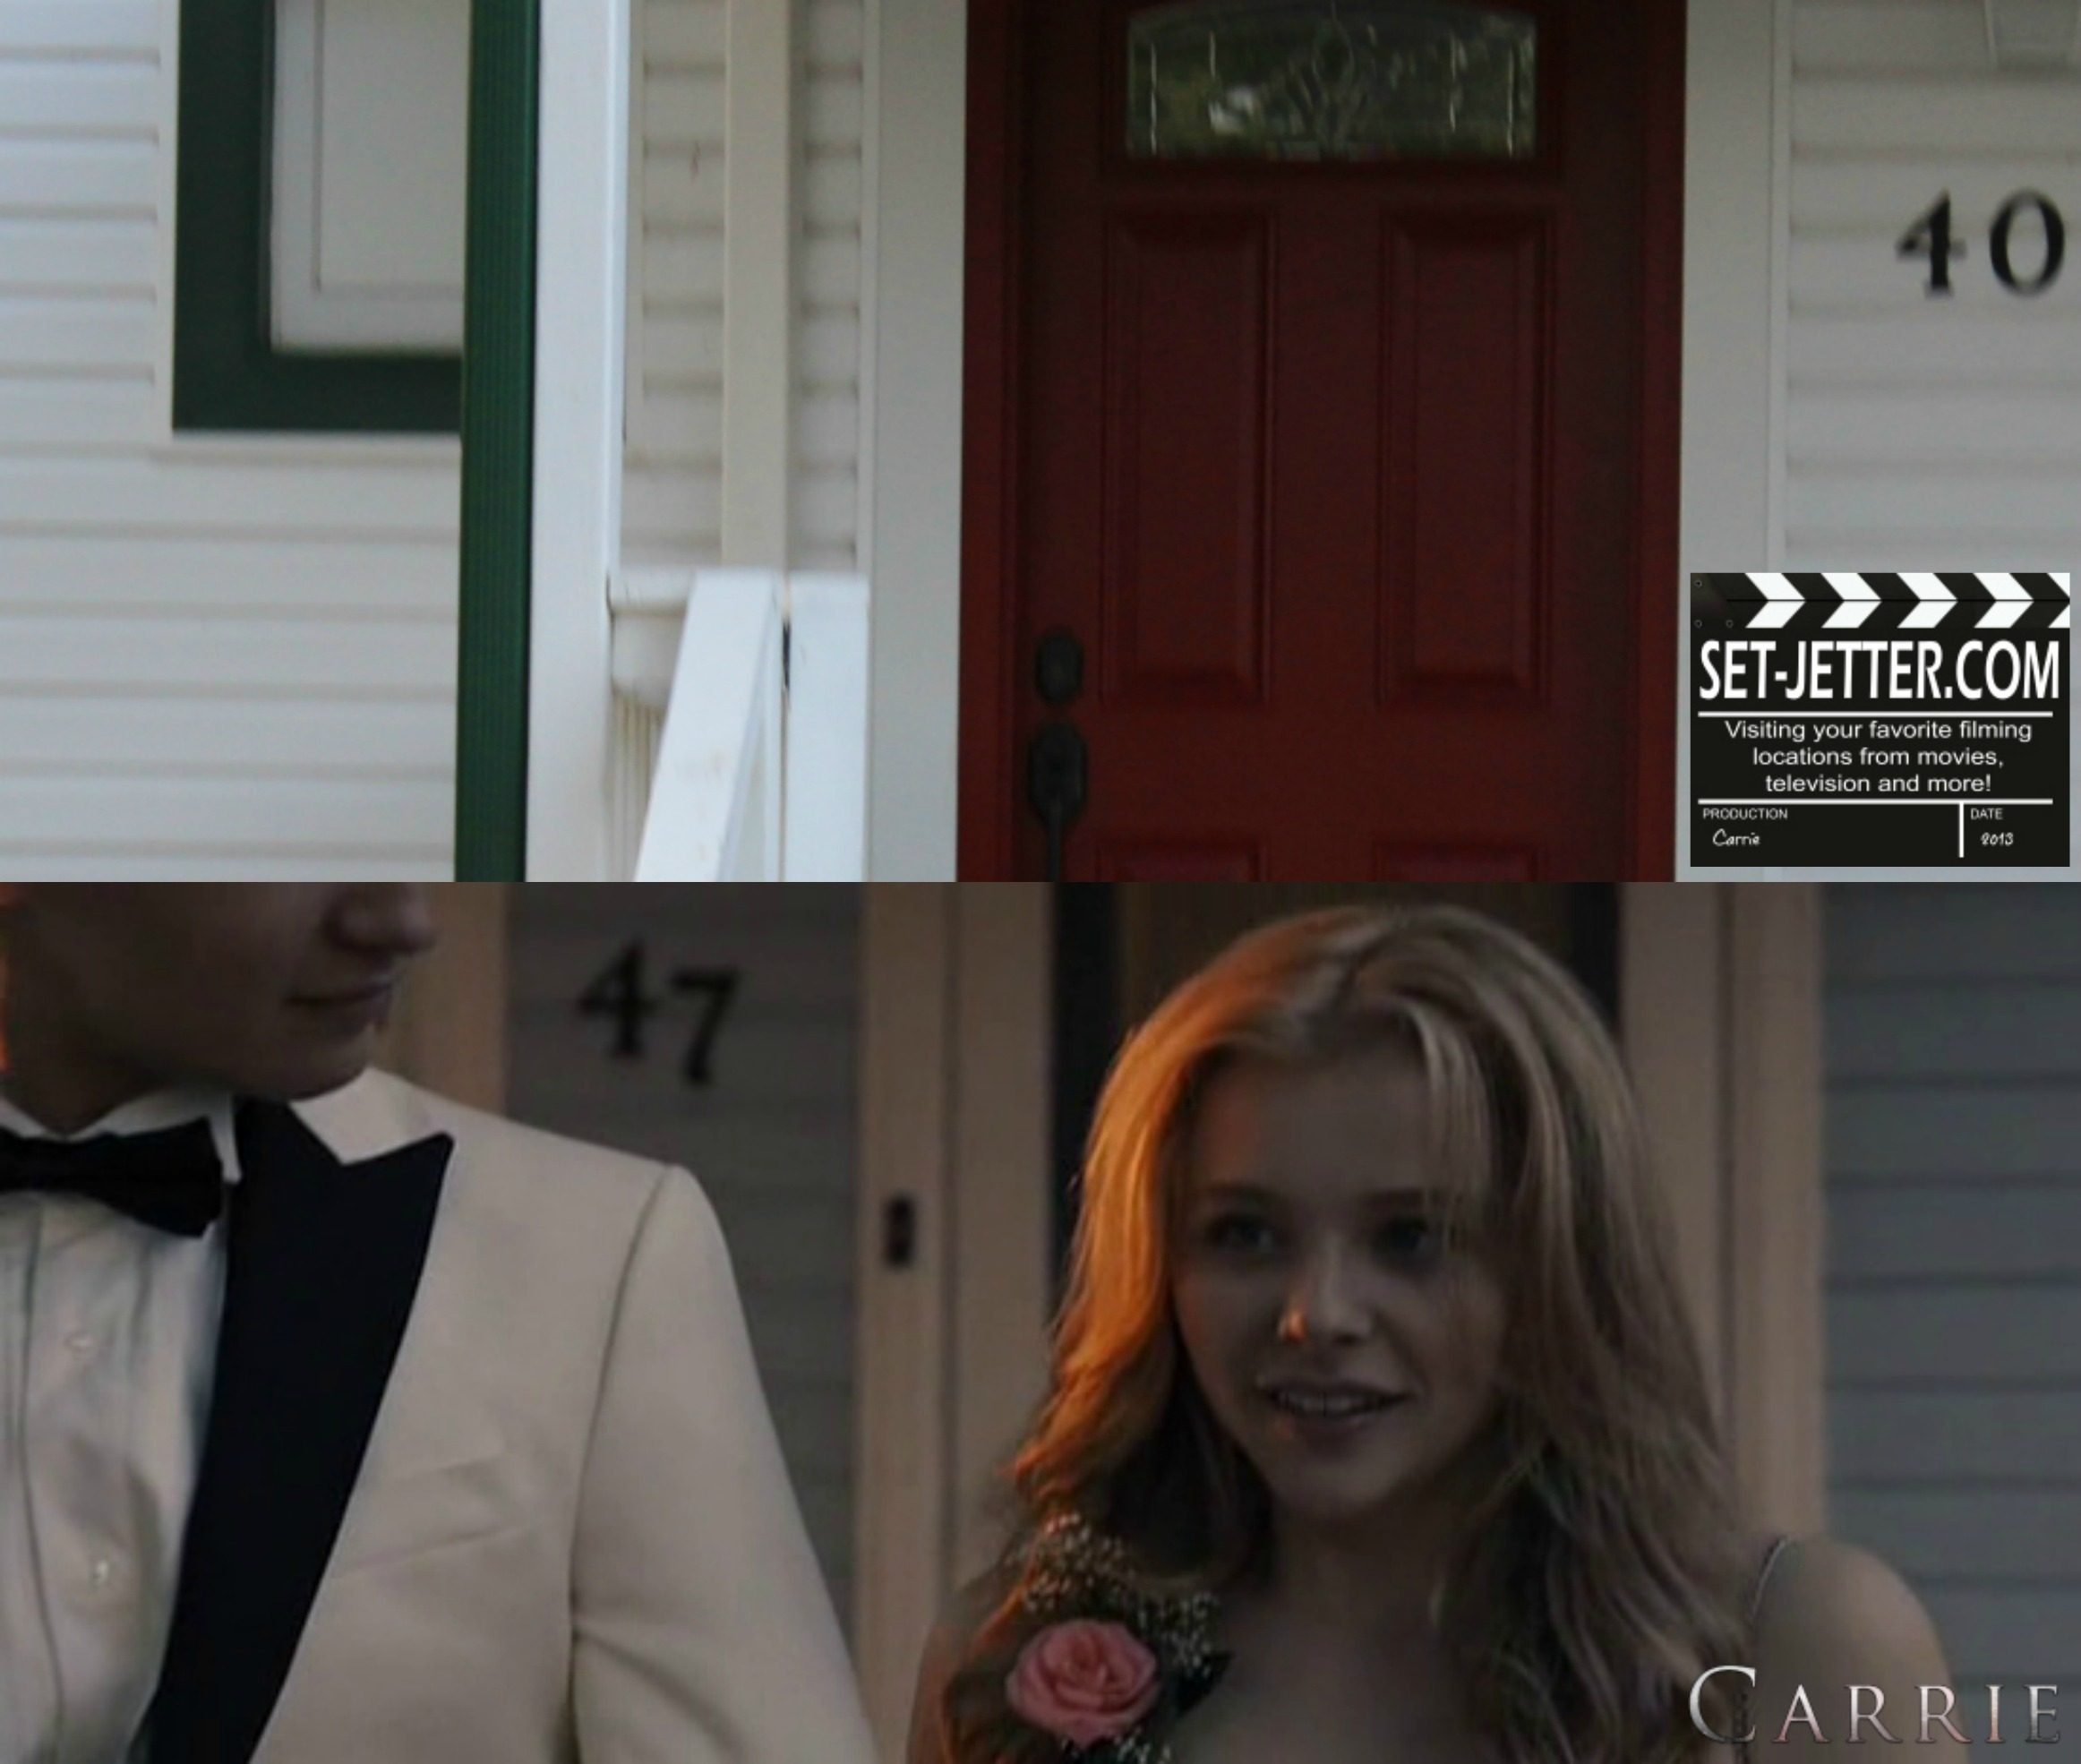 Carrie 2013 comparison 52.jpg